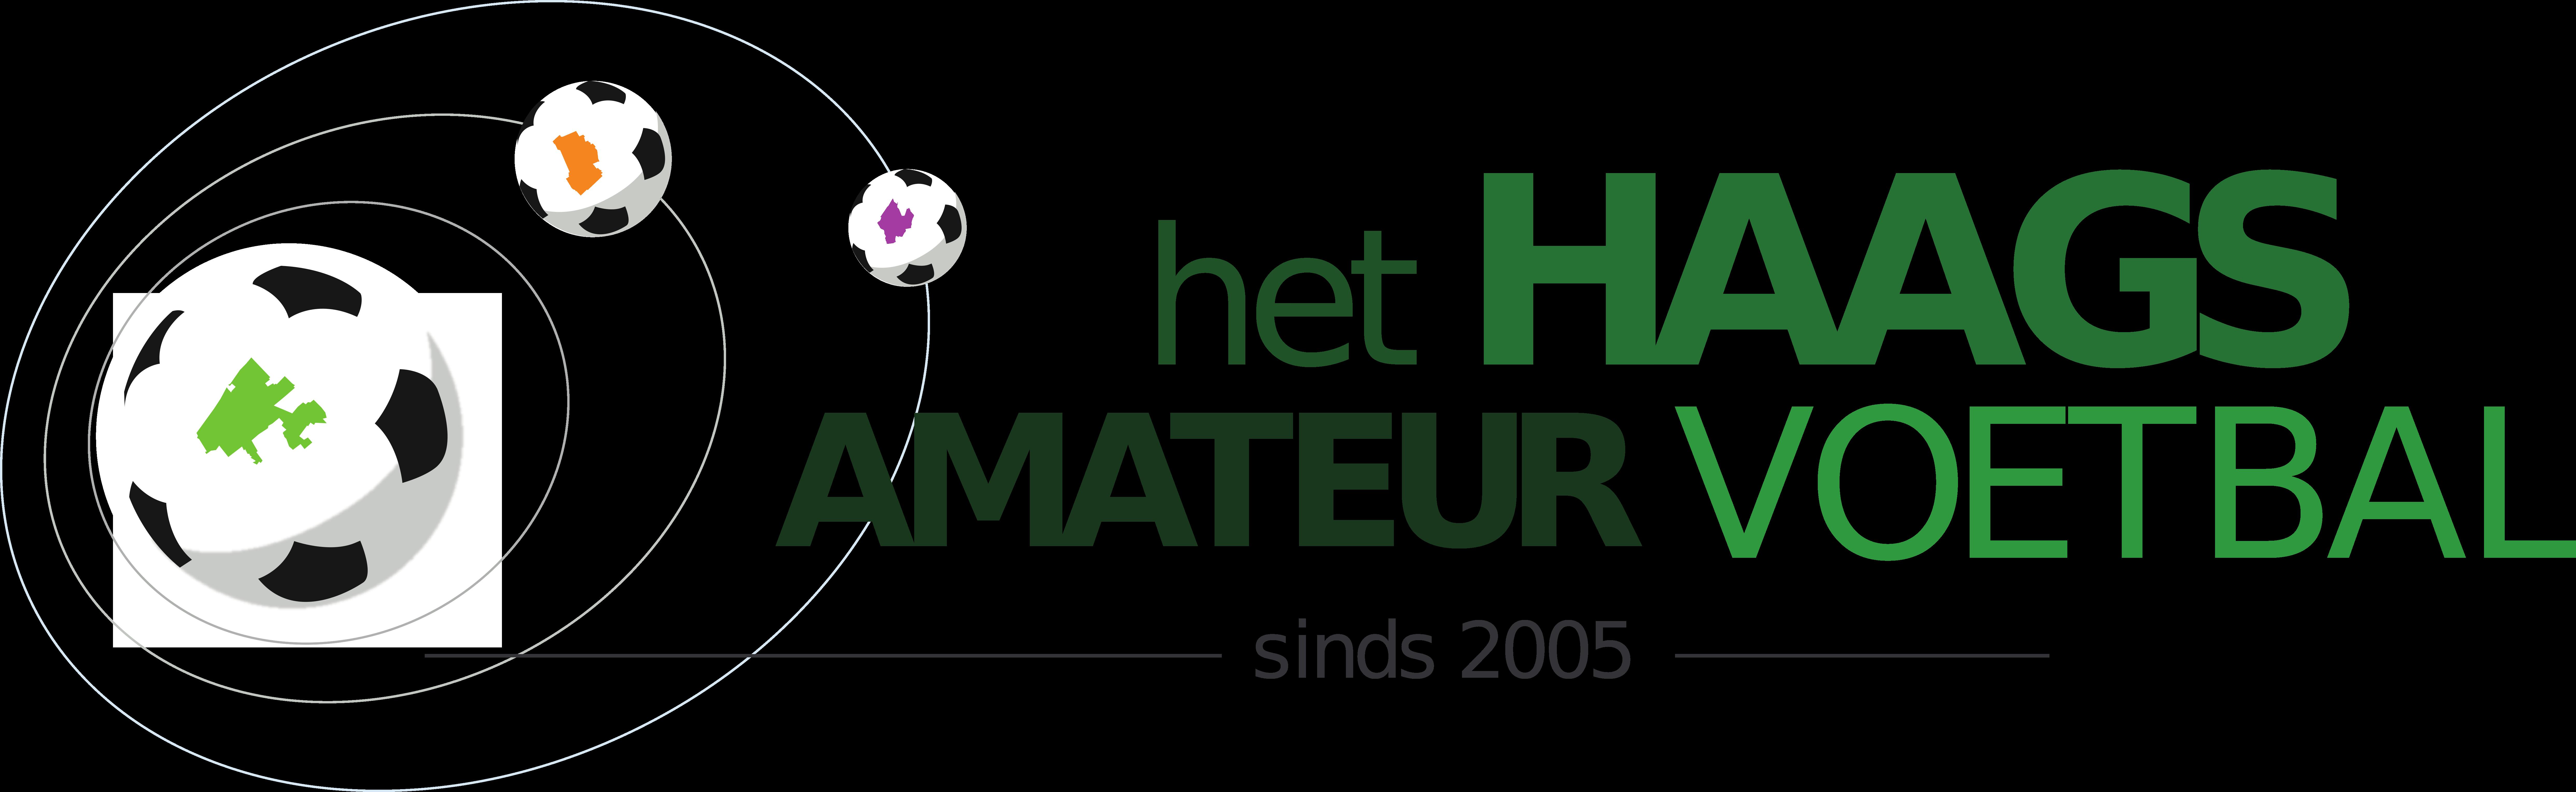 Het Haags Amateurvoetbal